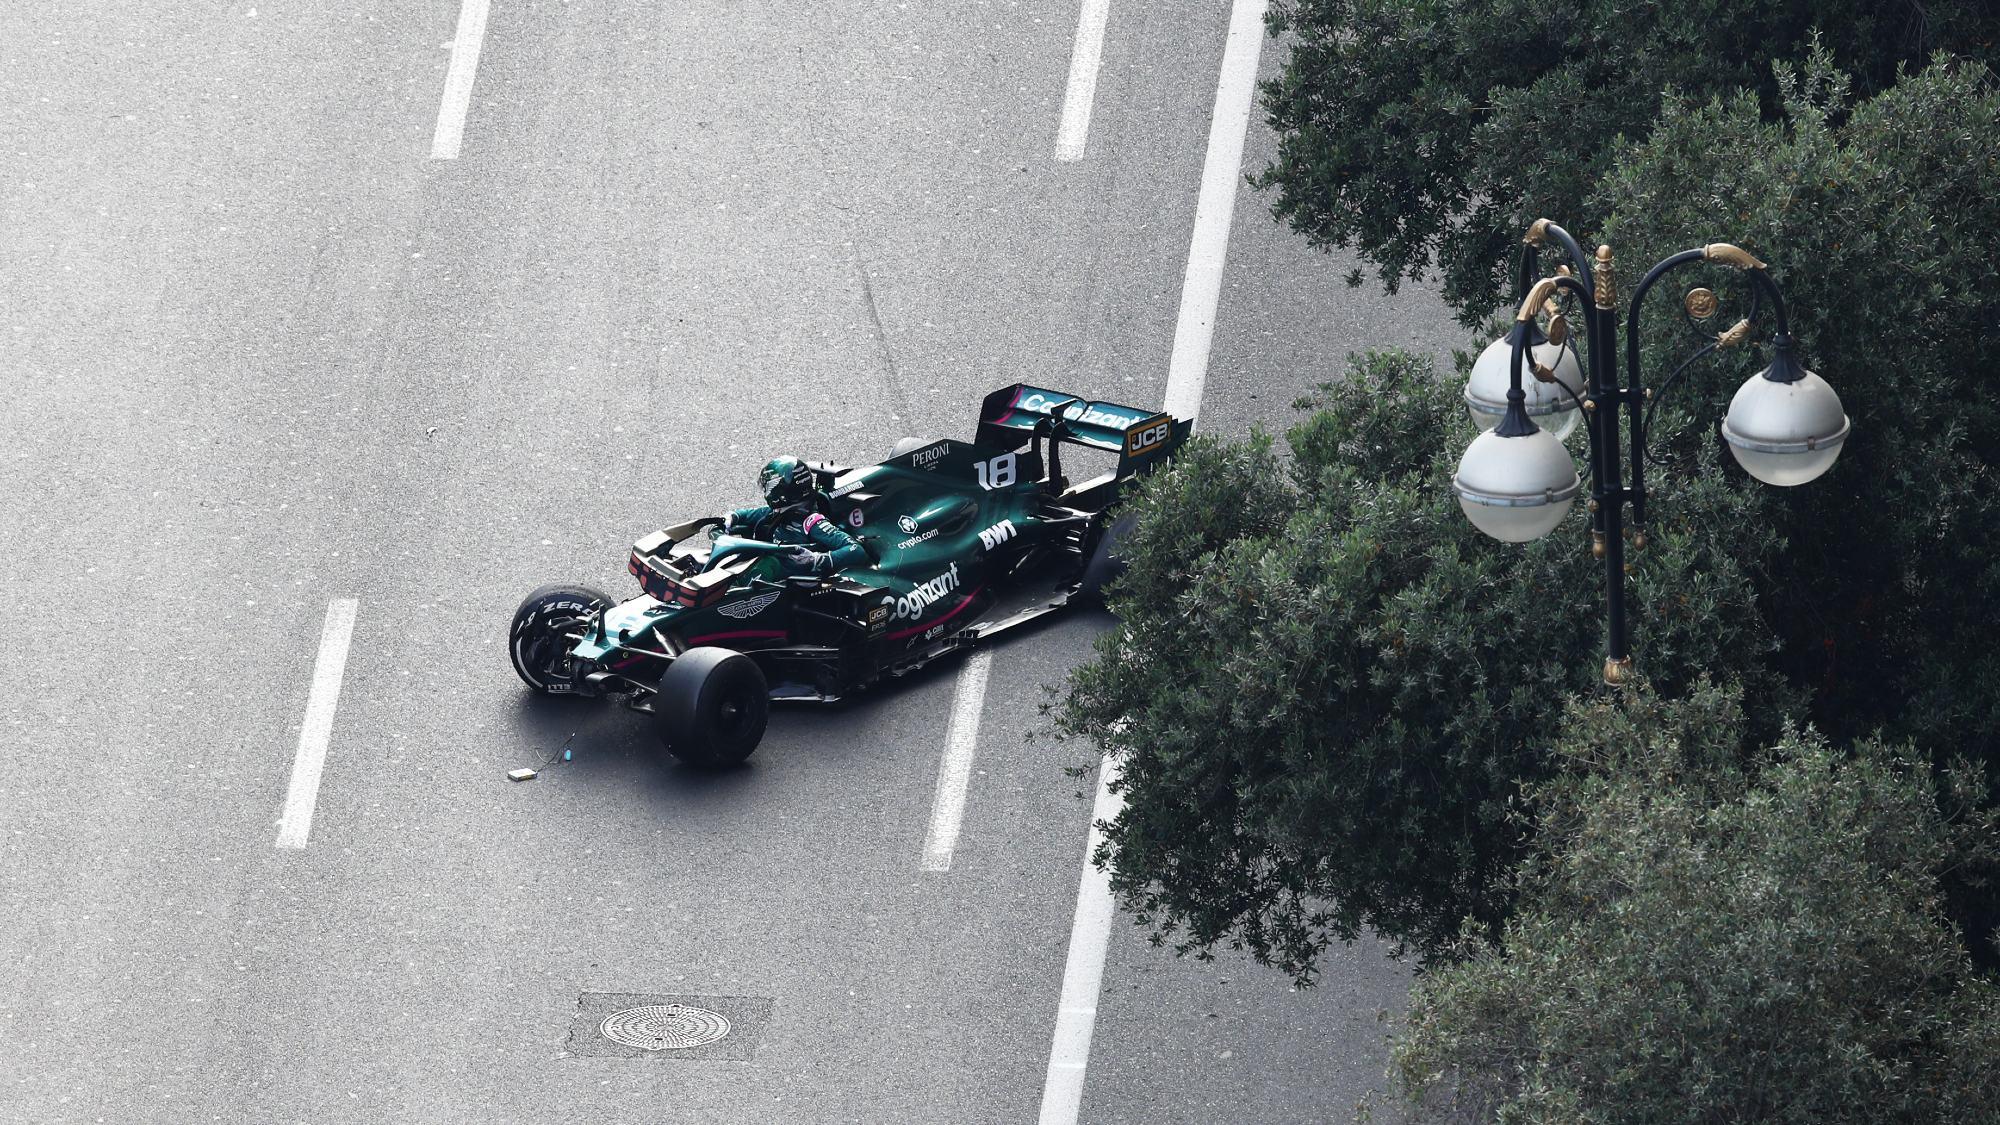 Lance Stroll, 2021 Azerbaijan GP